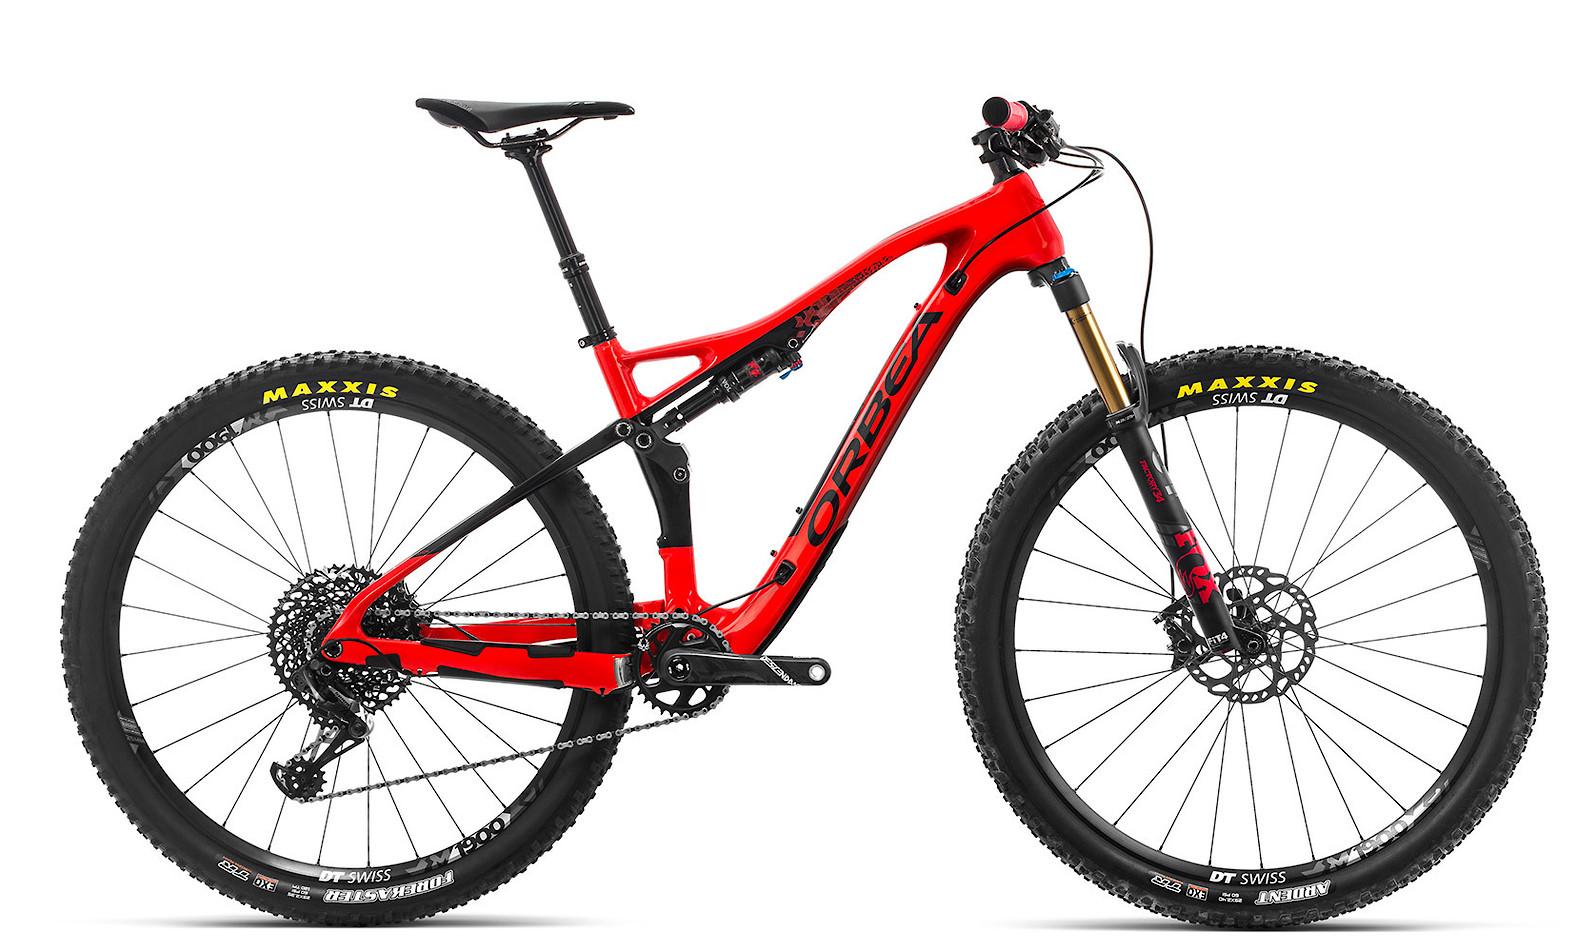 2019 Orbea Occam TR M10 Bike